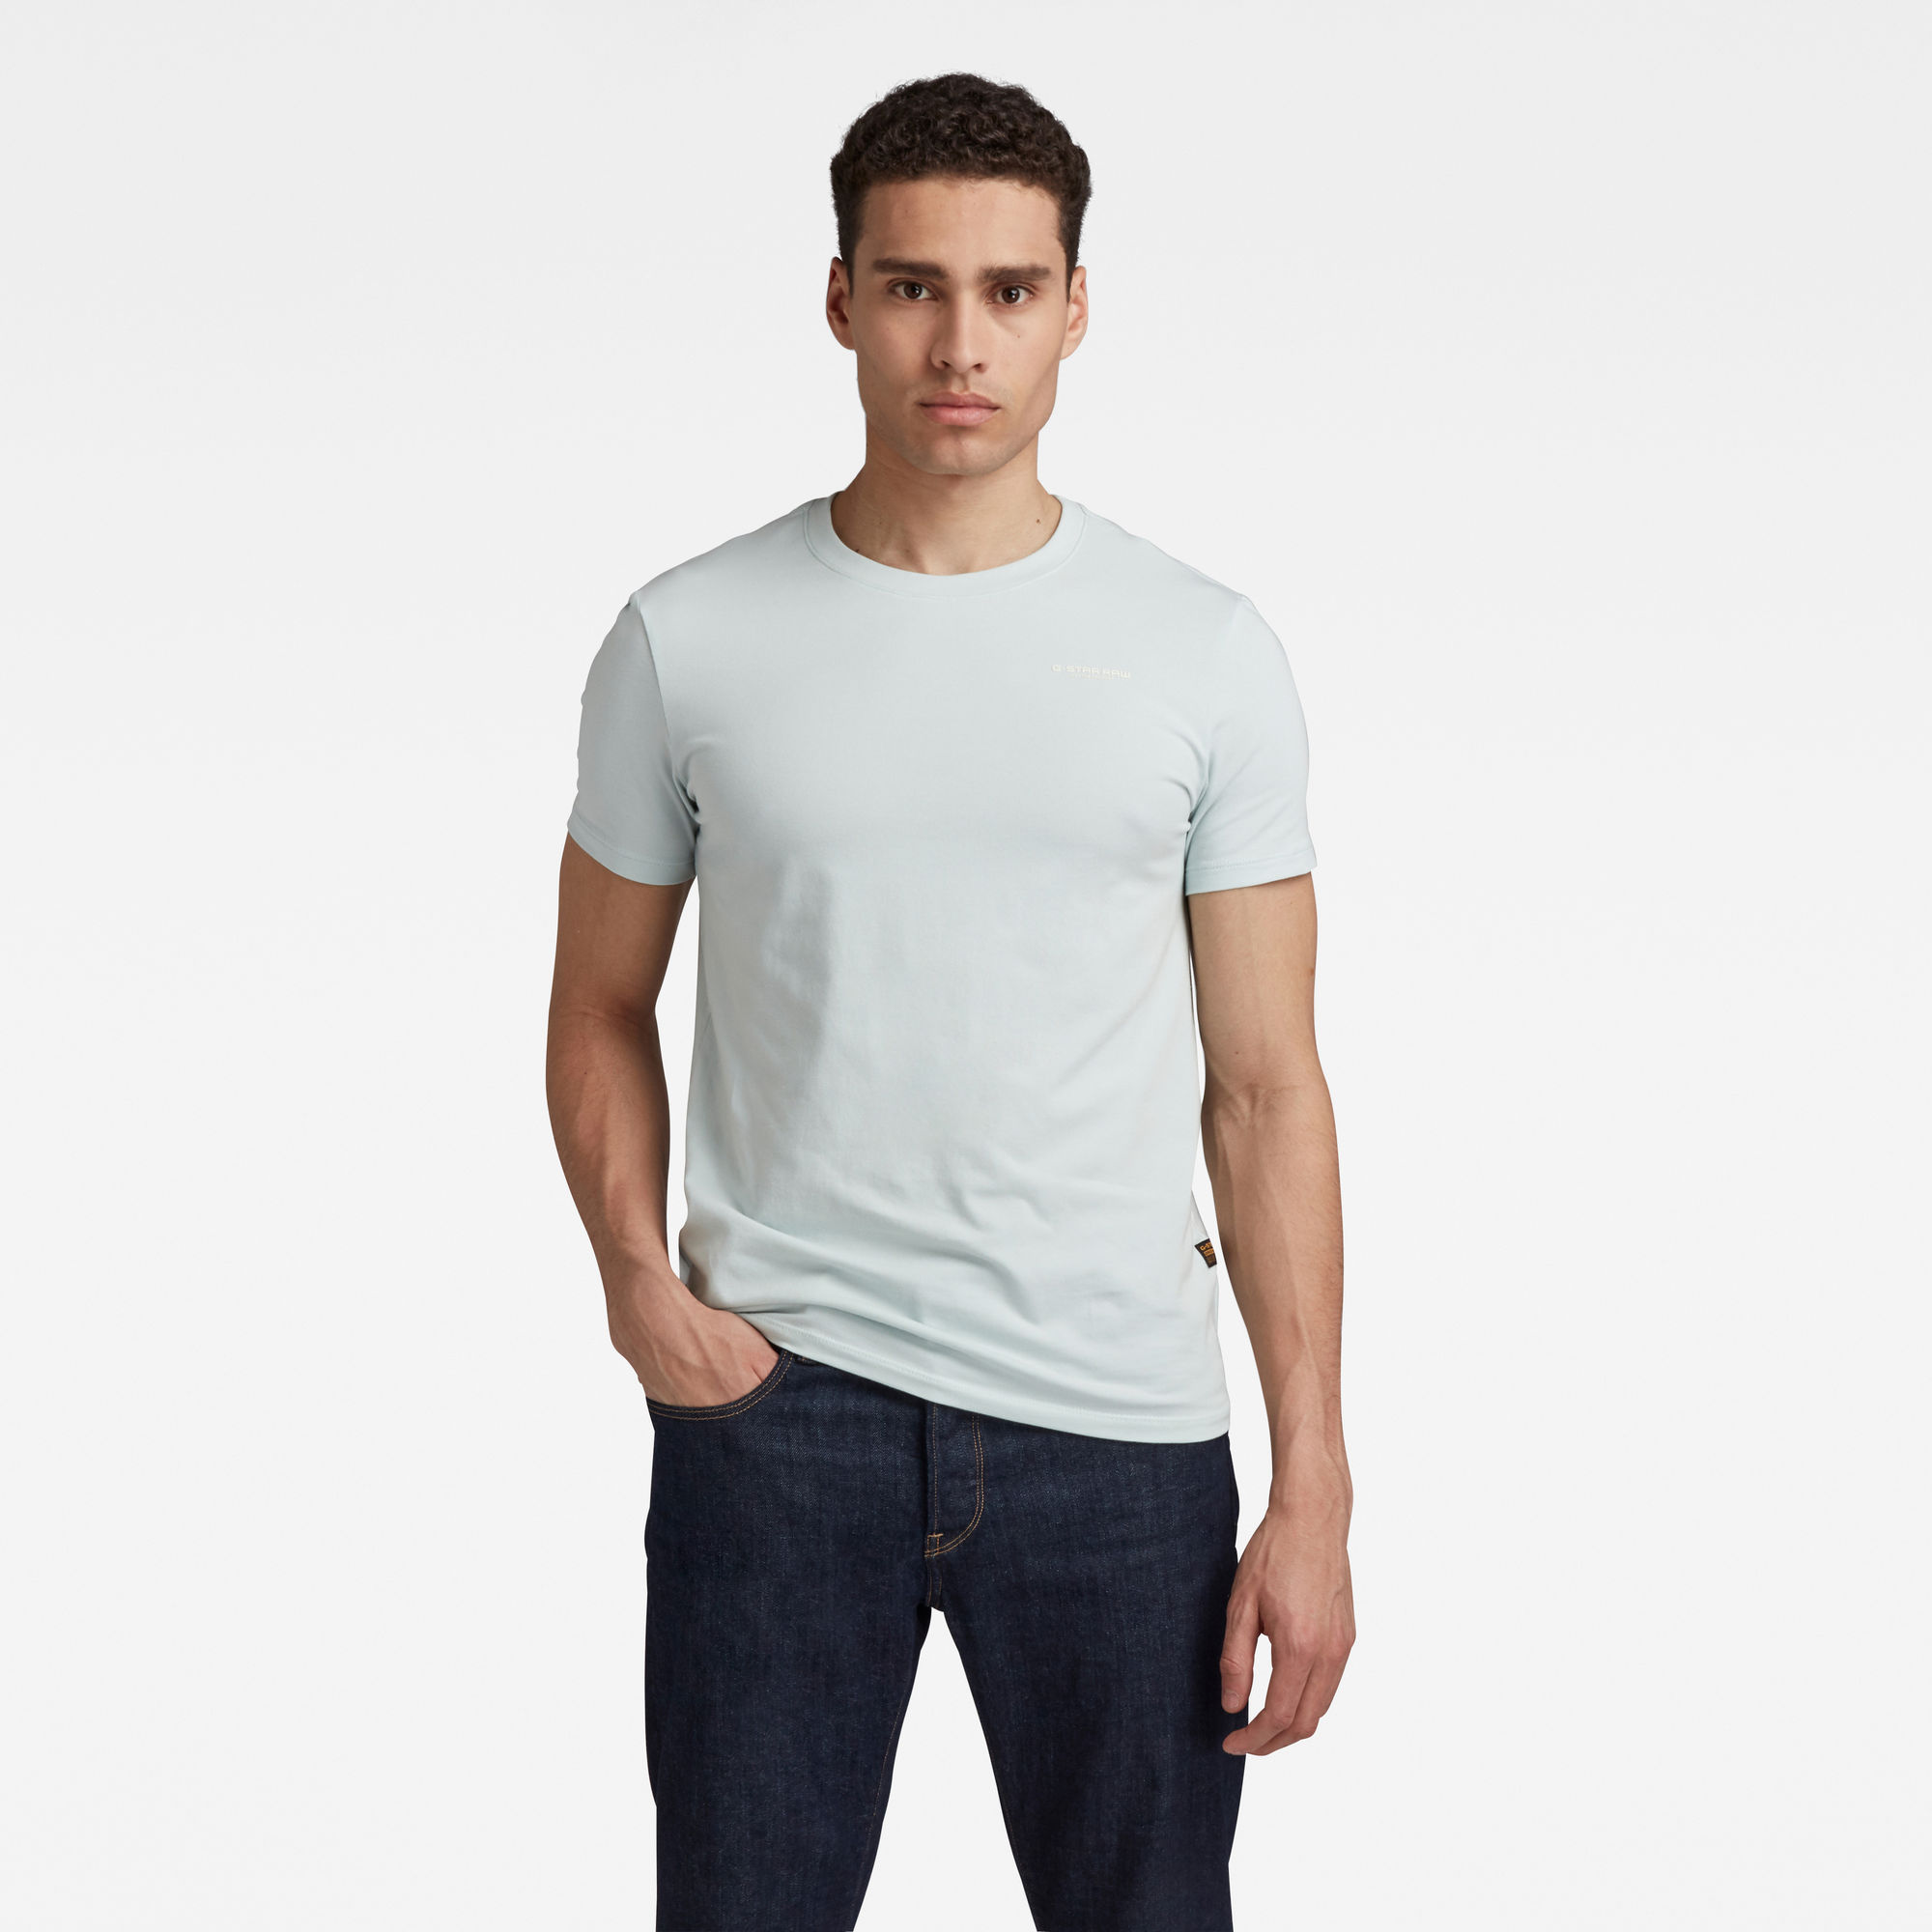 G-Star RAW Heren Slim Base T-Shirt Lichtblauw